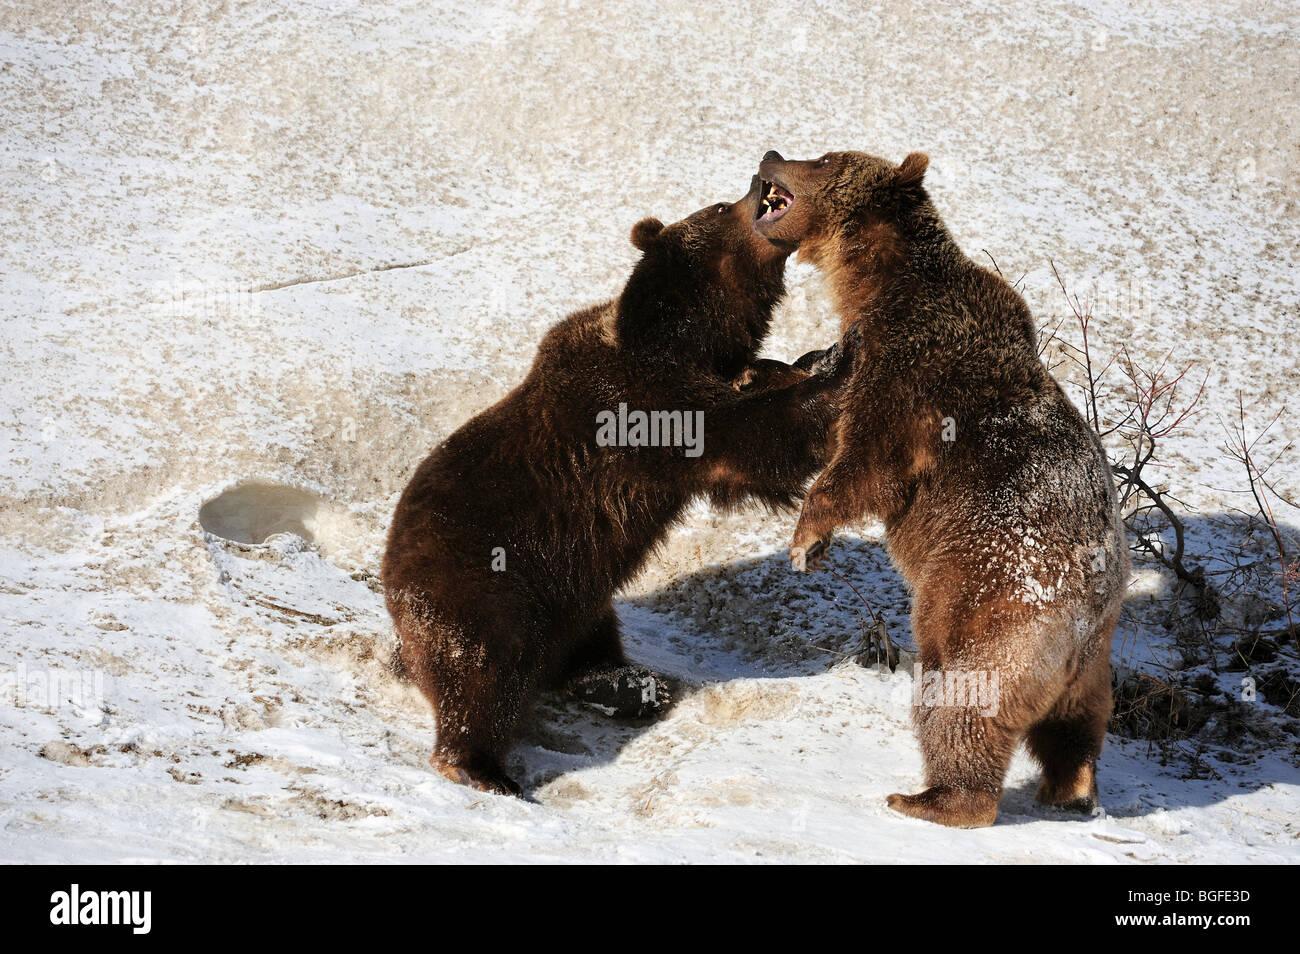 Grizzly bear (Ursus arctos) - captive siblings play fighting, Bozeman, Montana, USA - Stock Image